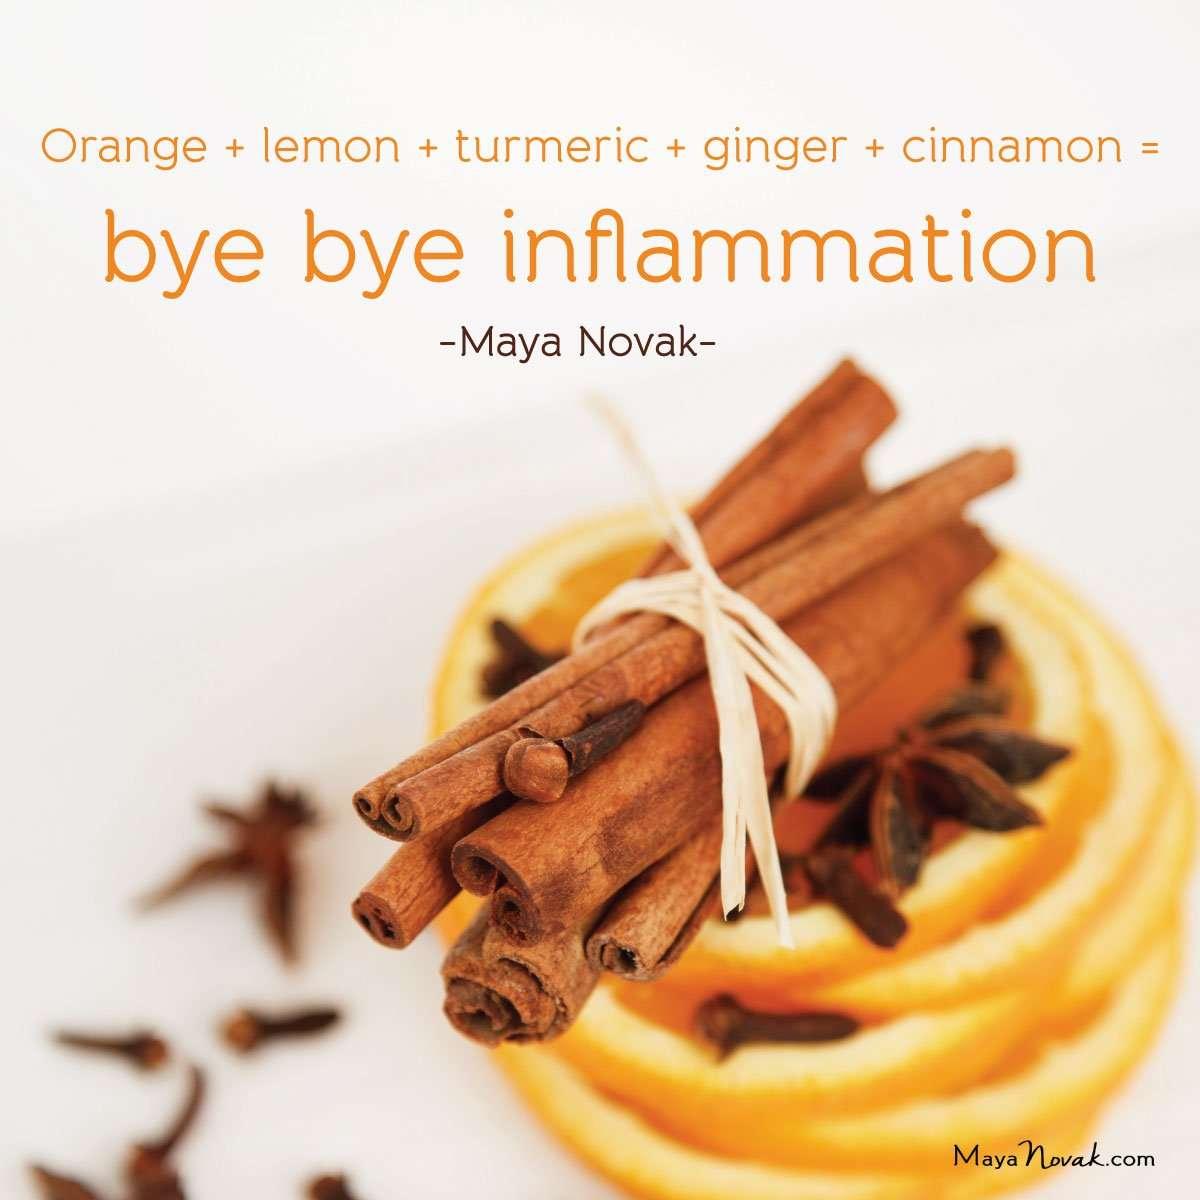 The Best Anti-Inflammatory Drink